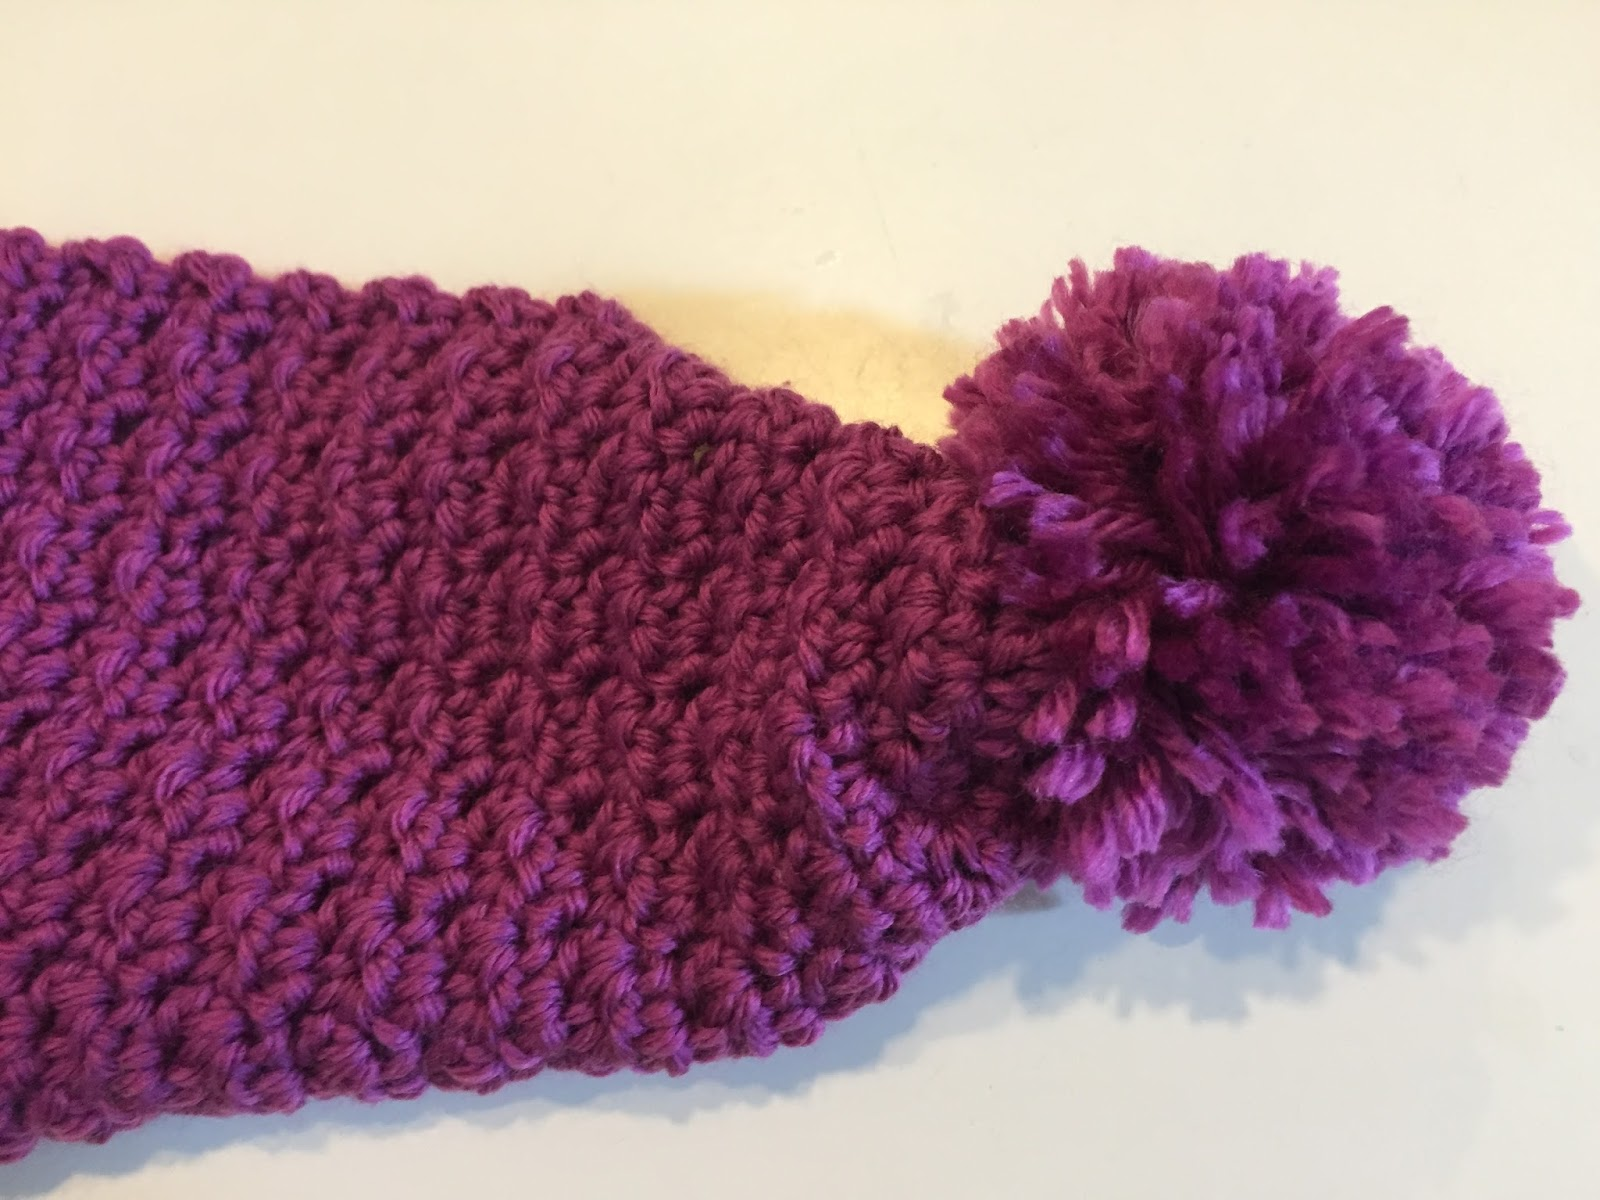 Crochet Patterns L Hook : Skein and Hook: Free Crochet Pattern: The Greene Pom Pom Scarf